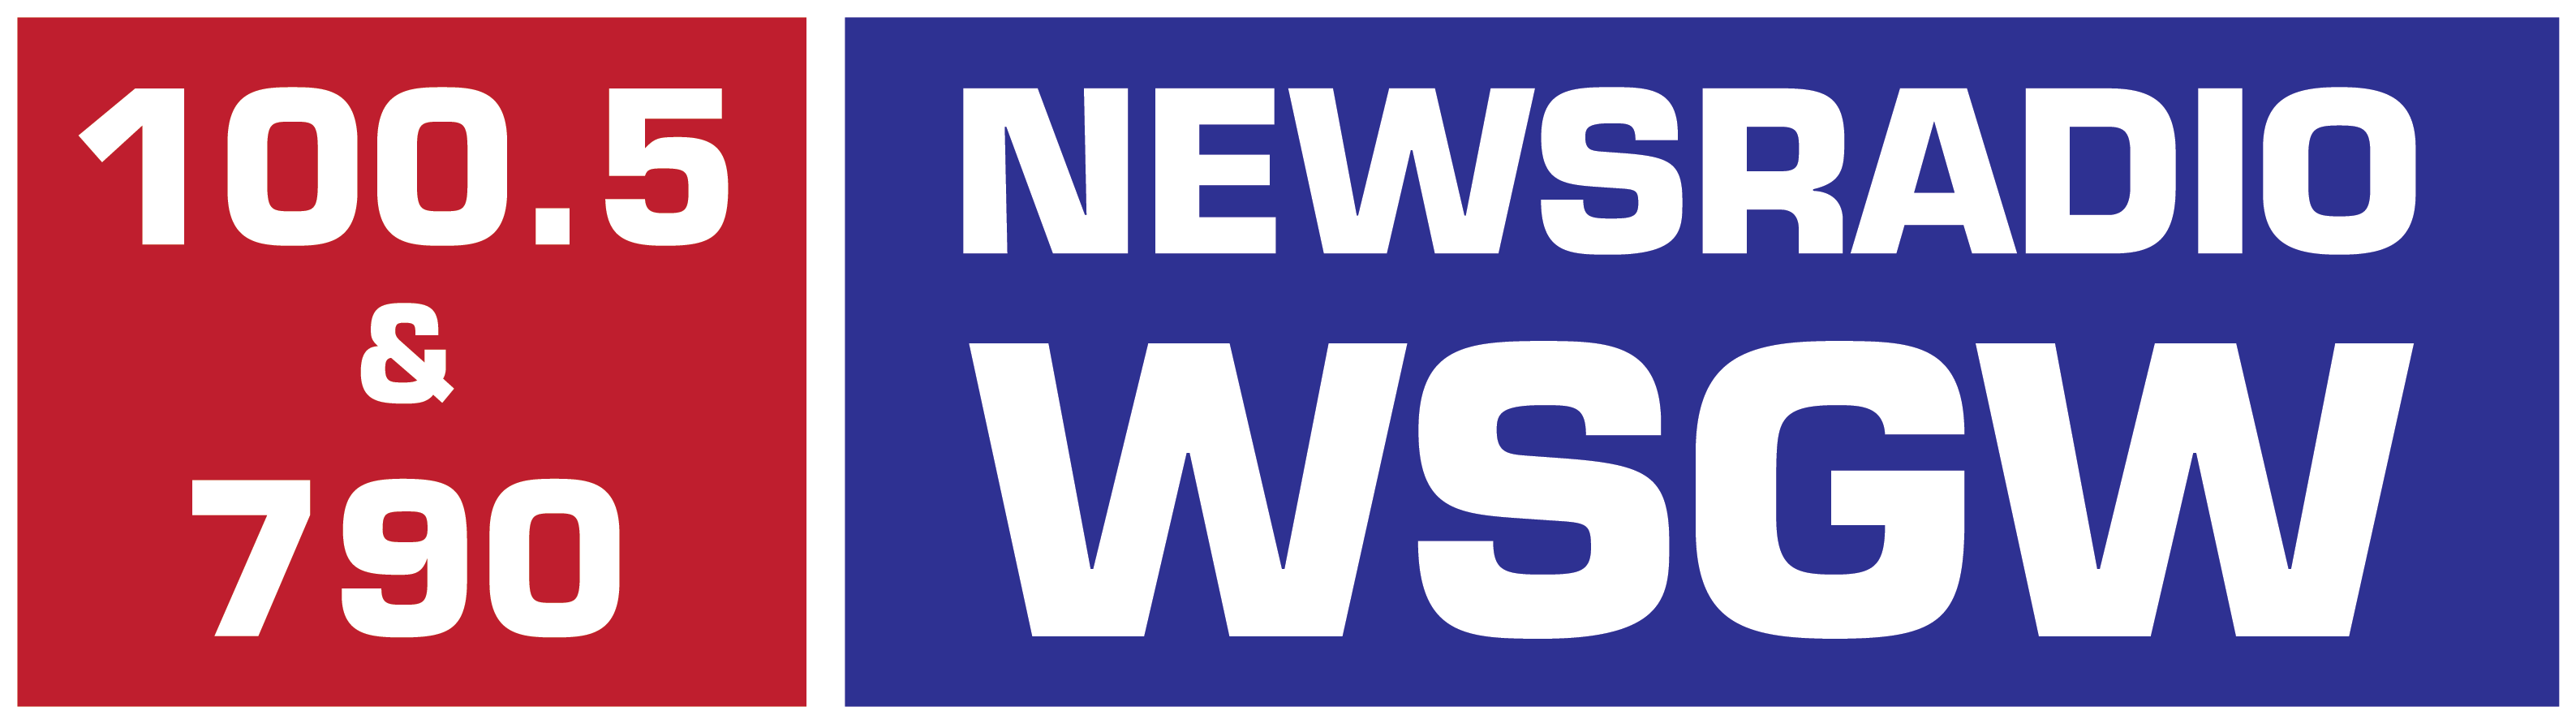 WSGN Logo